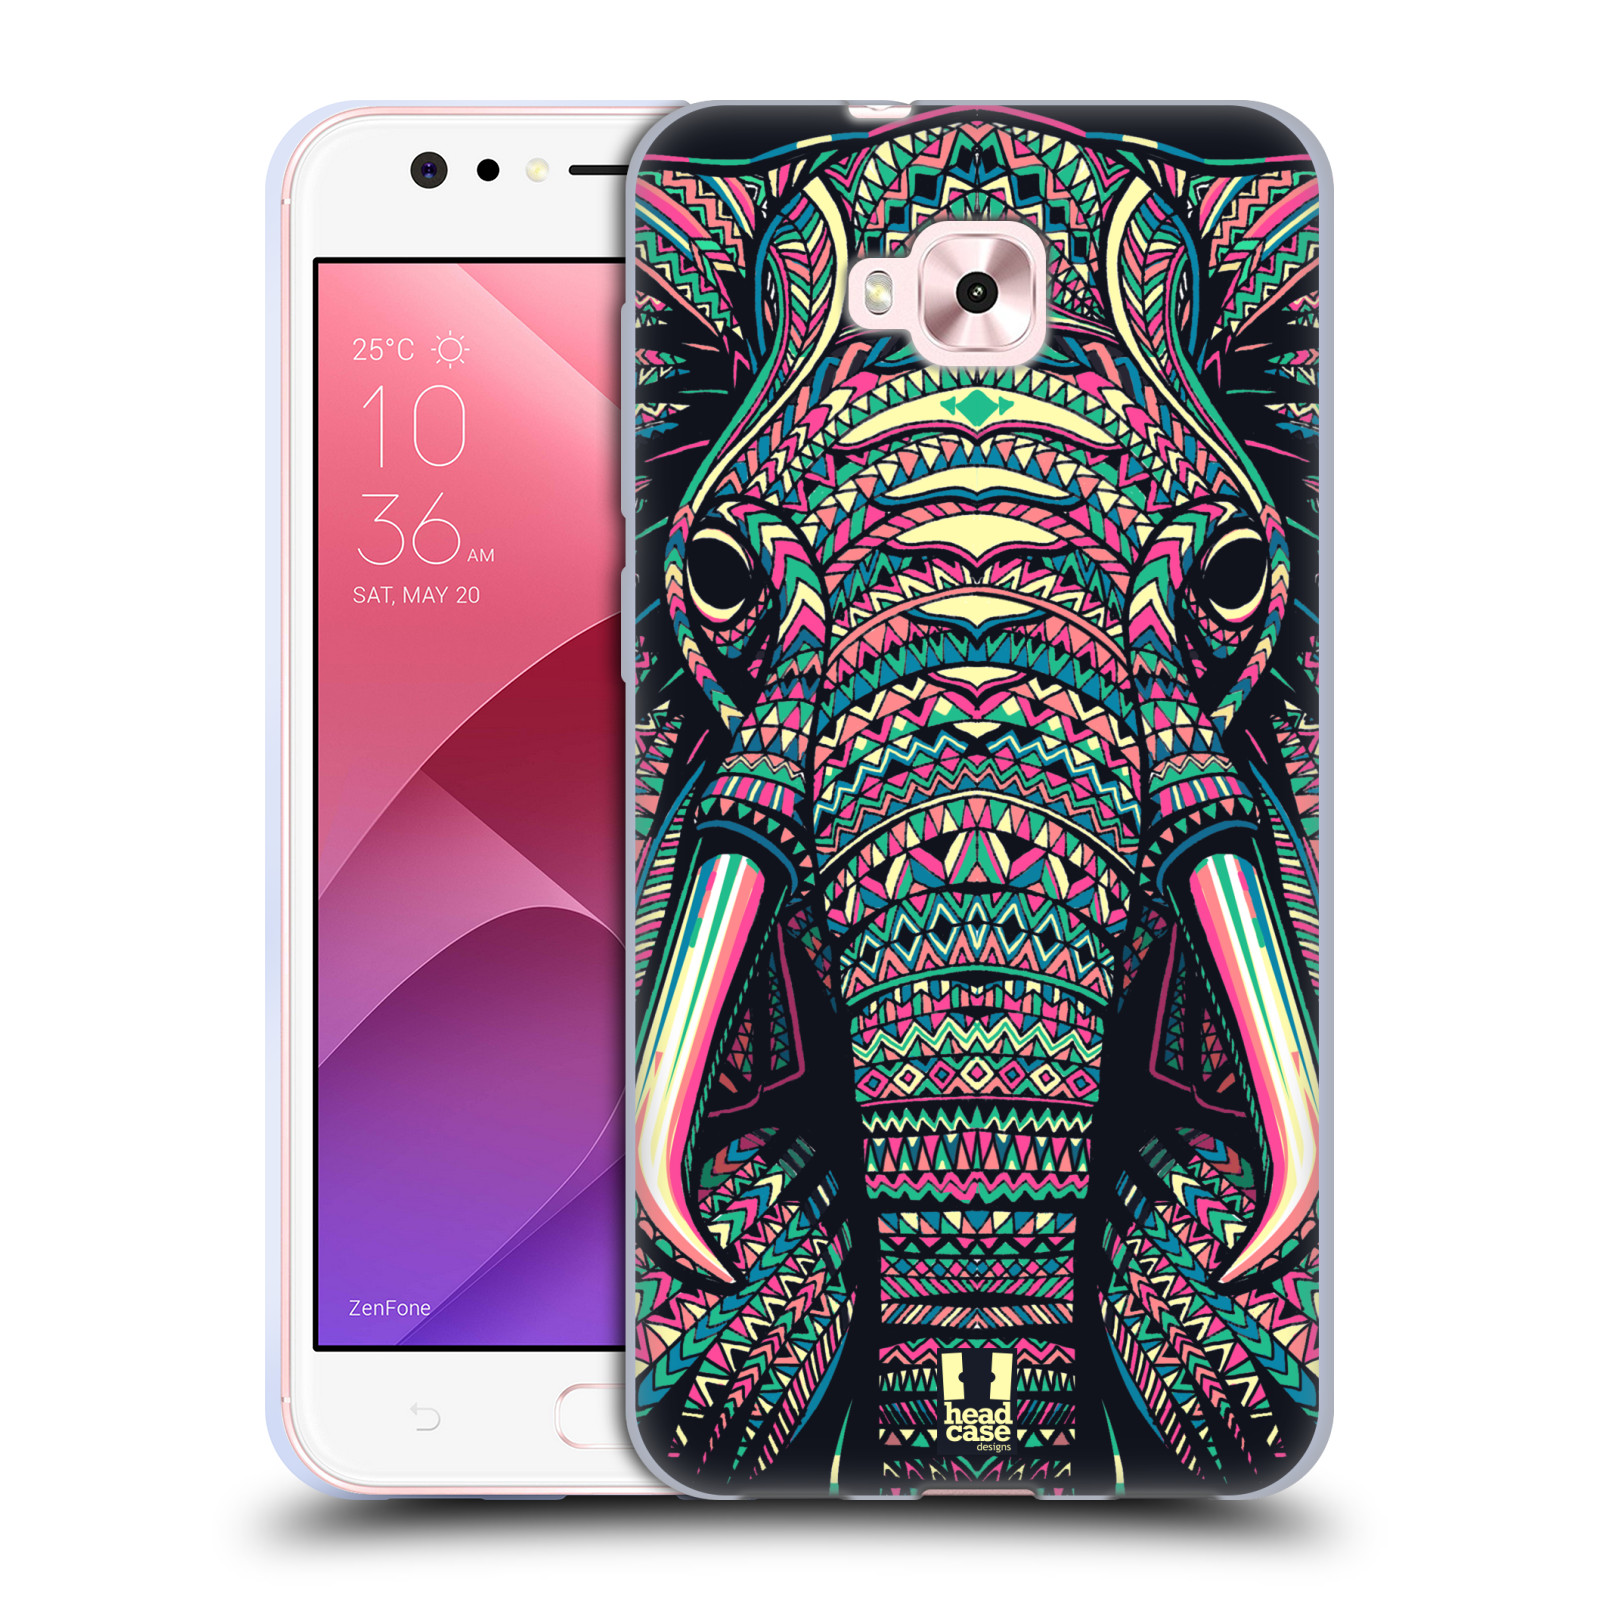 Silikonové pouzdro na mobil Asus Zenfone 4 Selfie ZD553KL - Head Case - AZTEC SLON